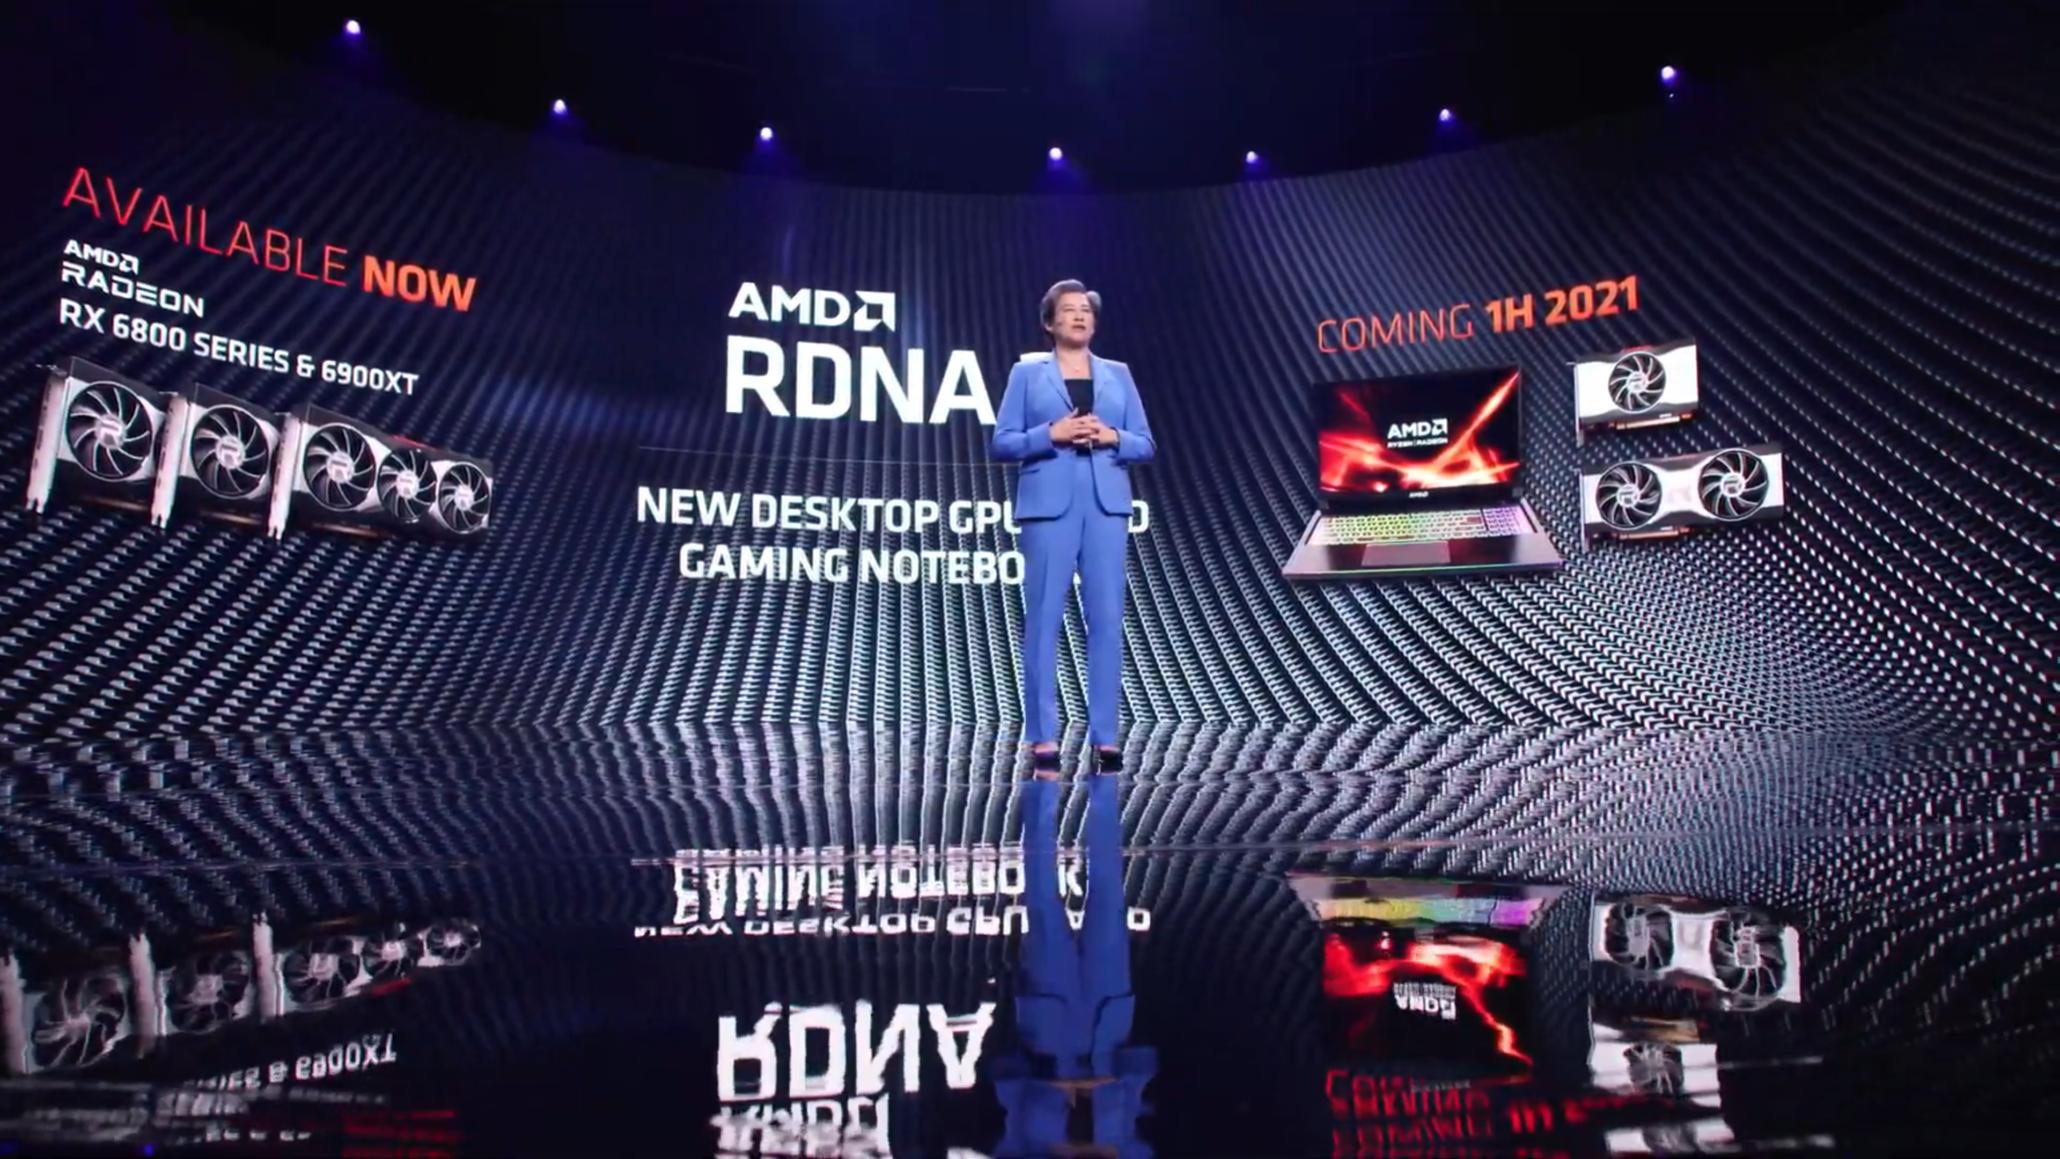 AMD Radeon RX 6500 Series GPU Dengan Navi 23 – Diperkirakan Akan Hadir Dengan 2048 Core